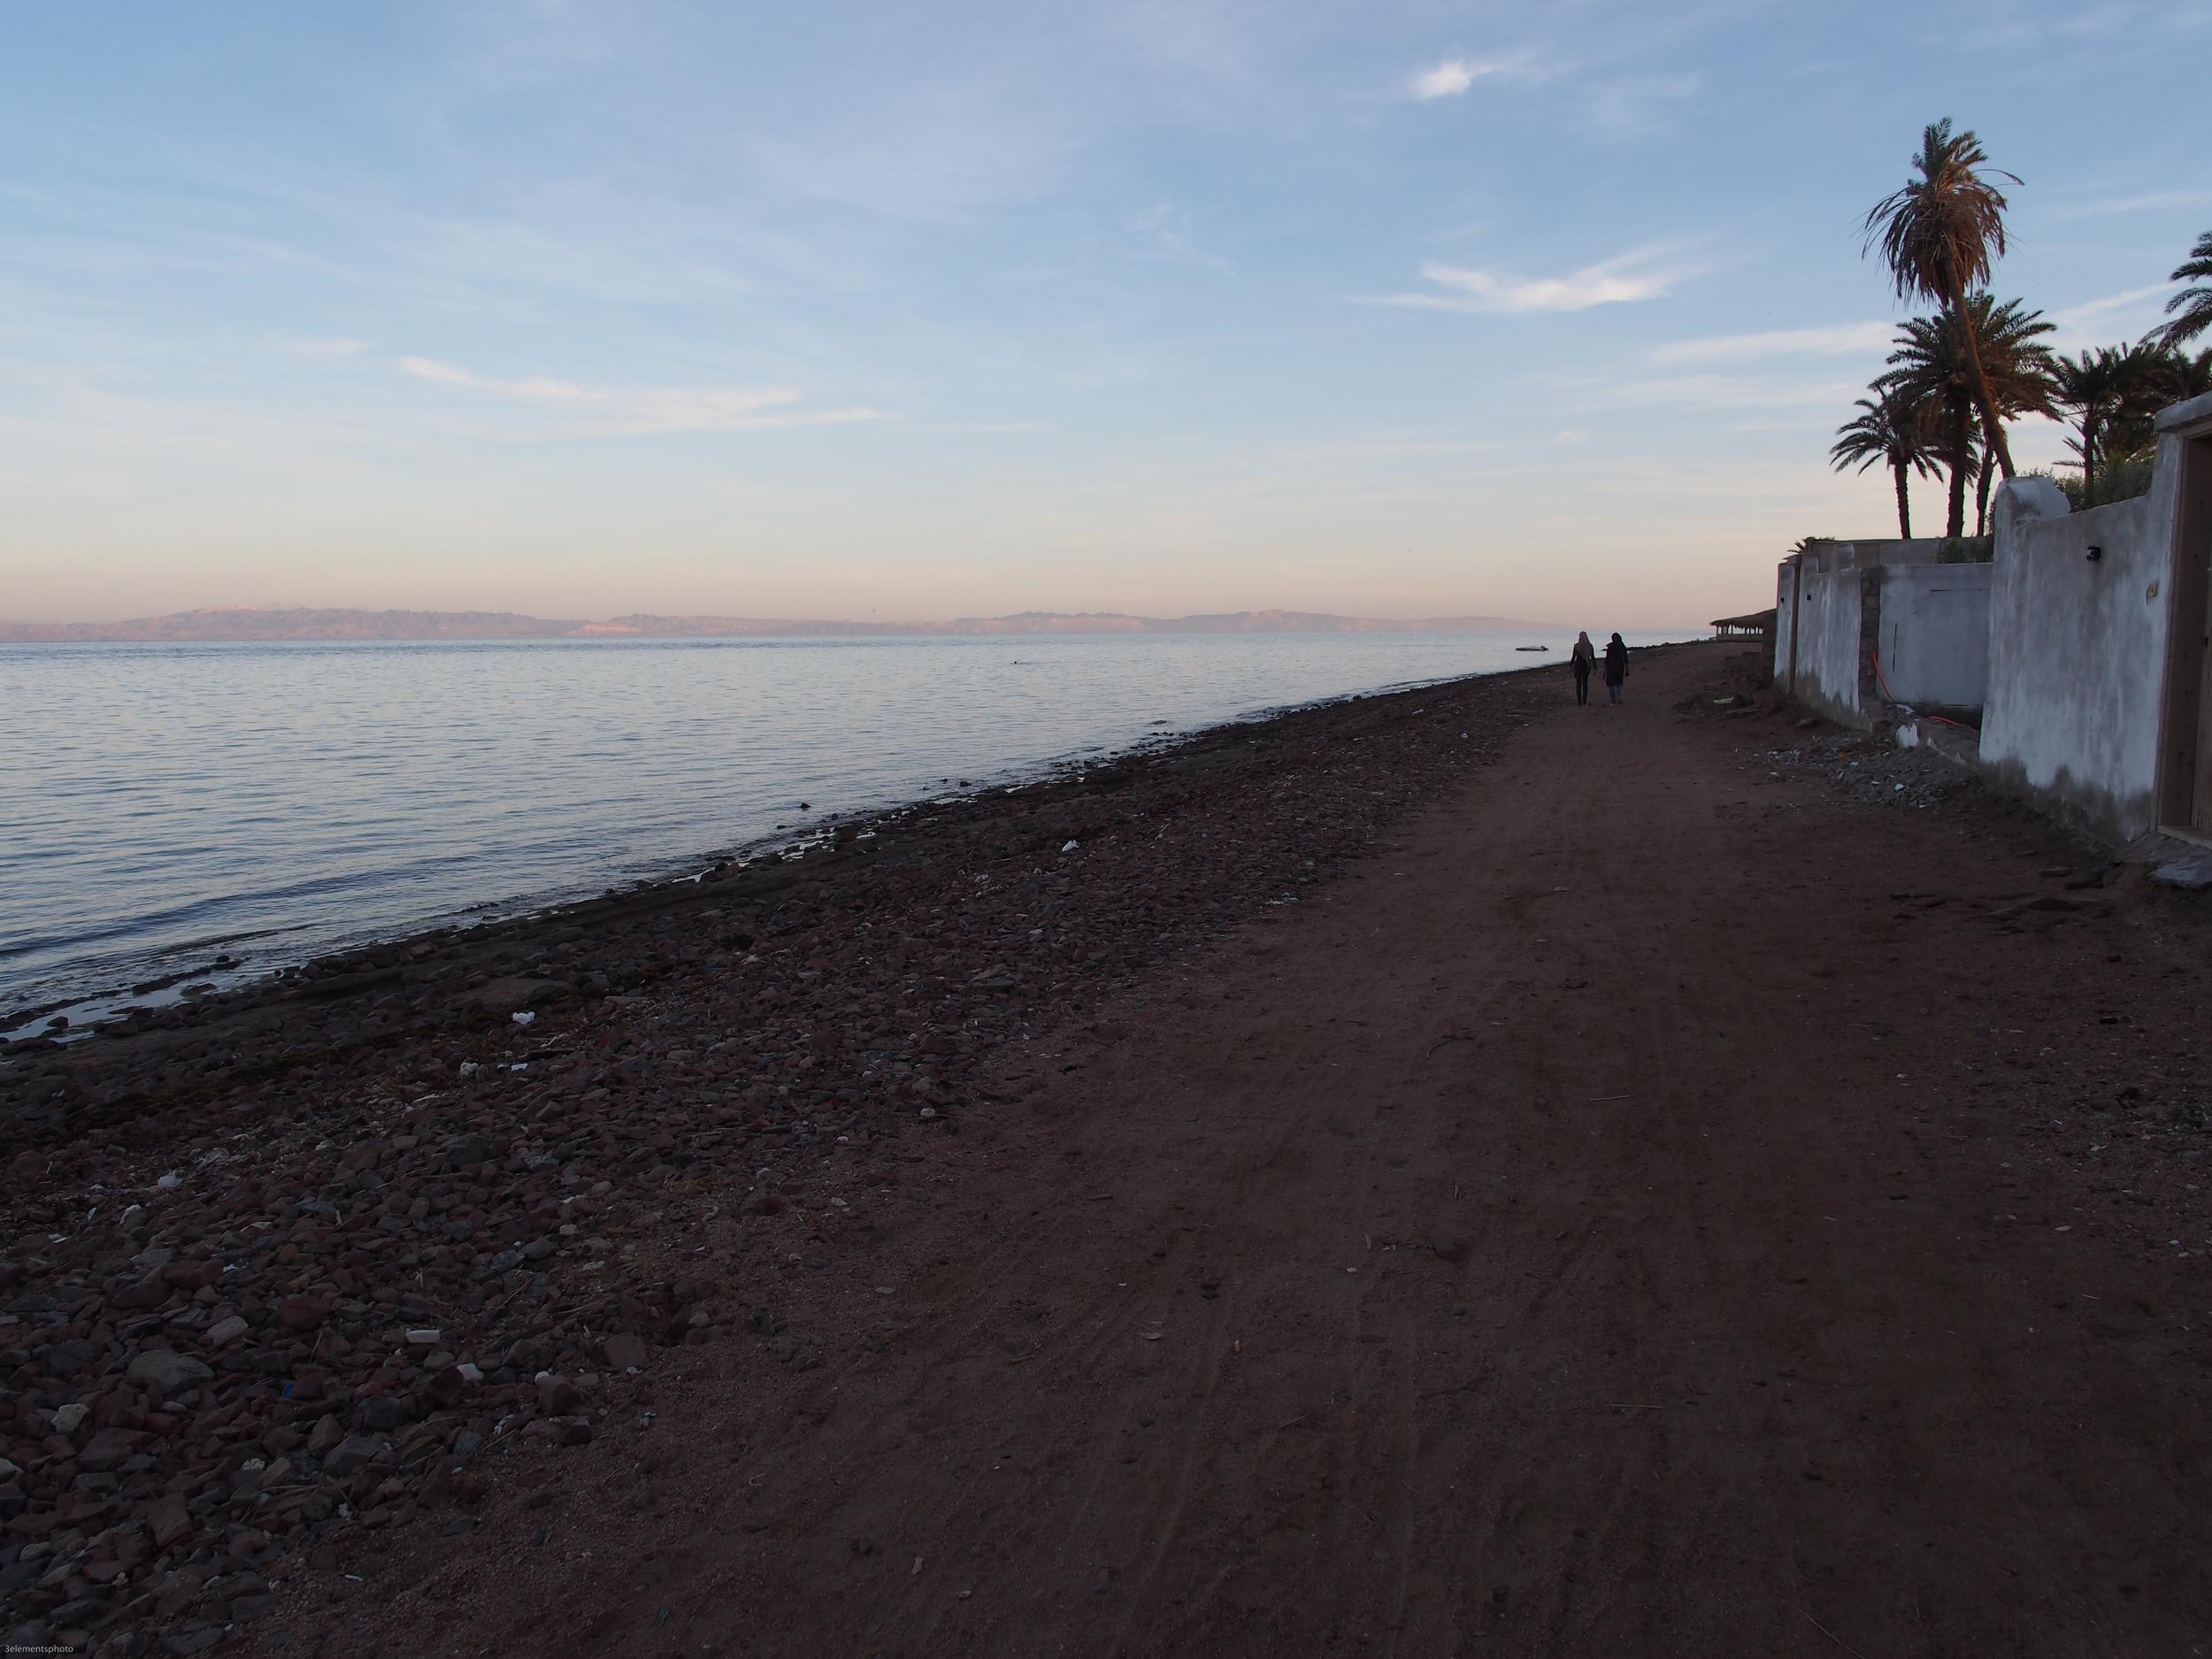 Assalah beach: The epitome of peace and stillness